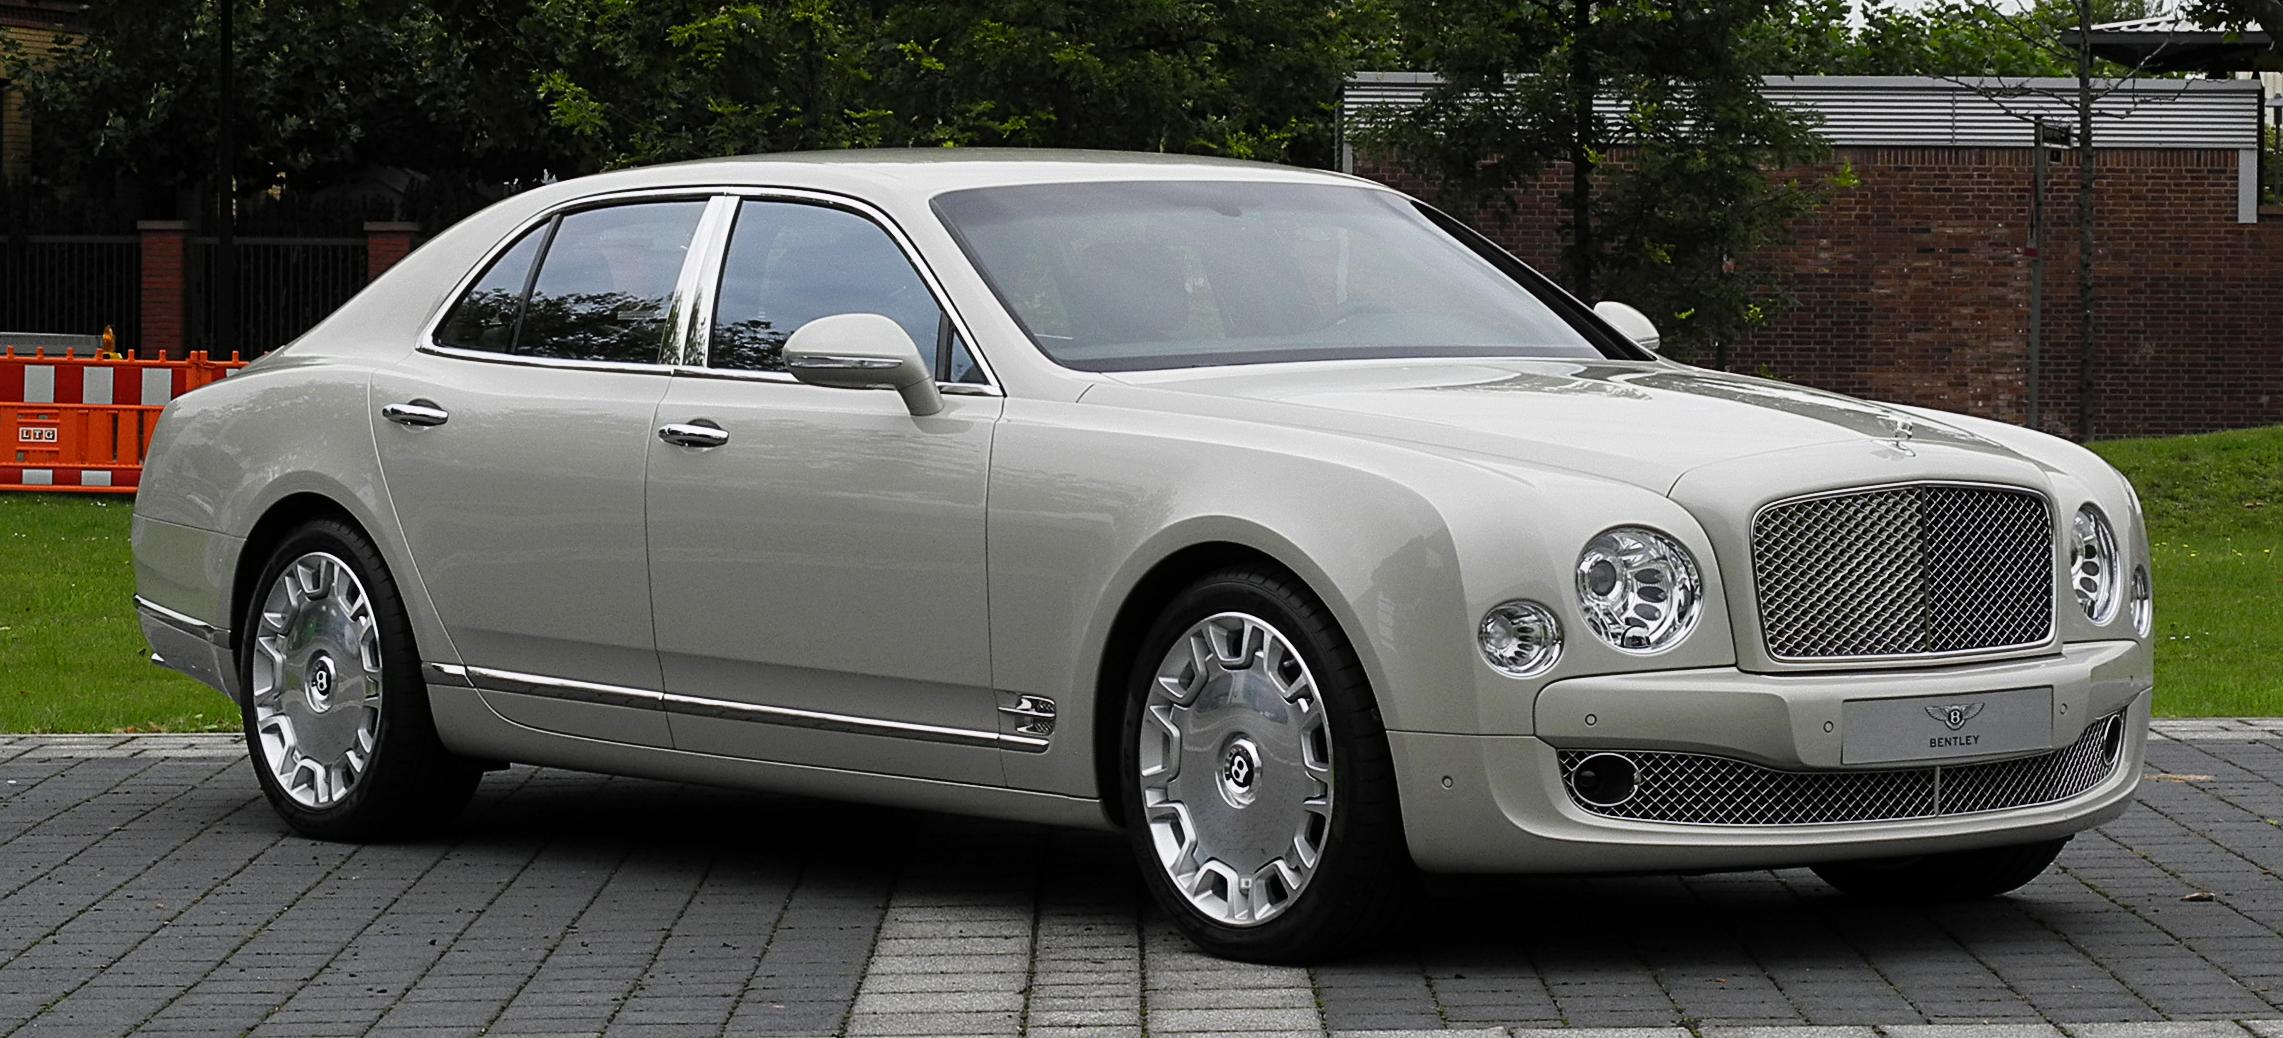 Luxury Car Hire Sfo